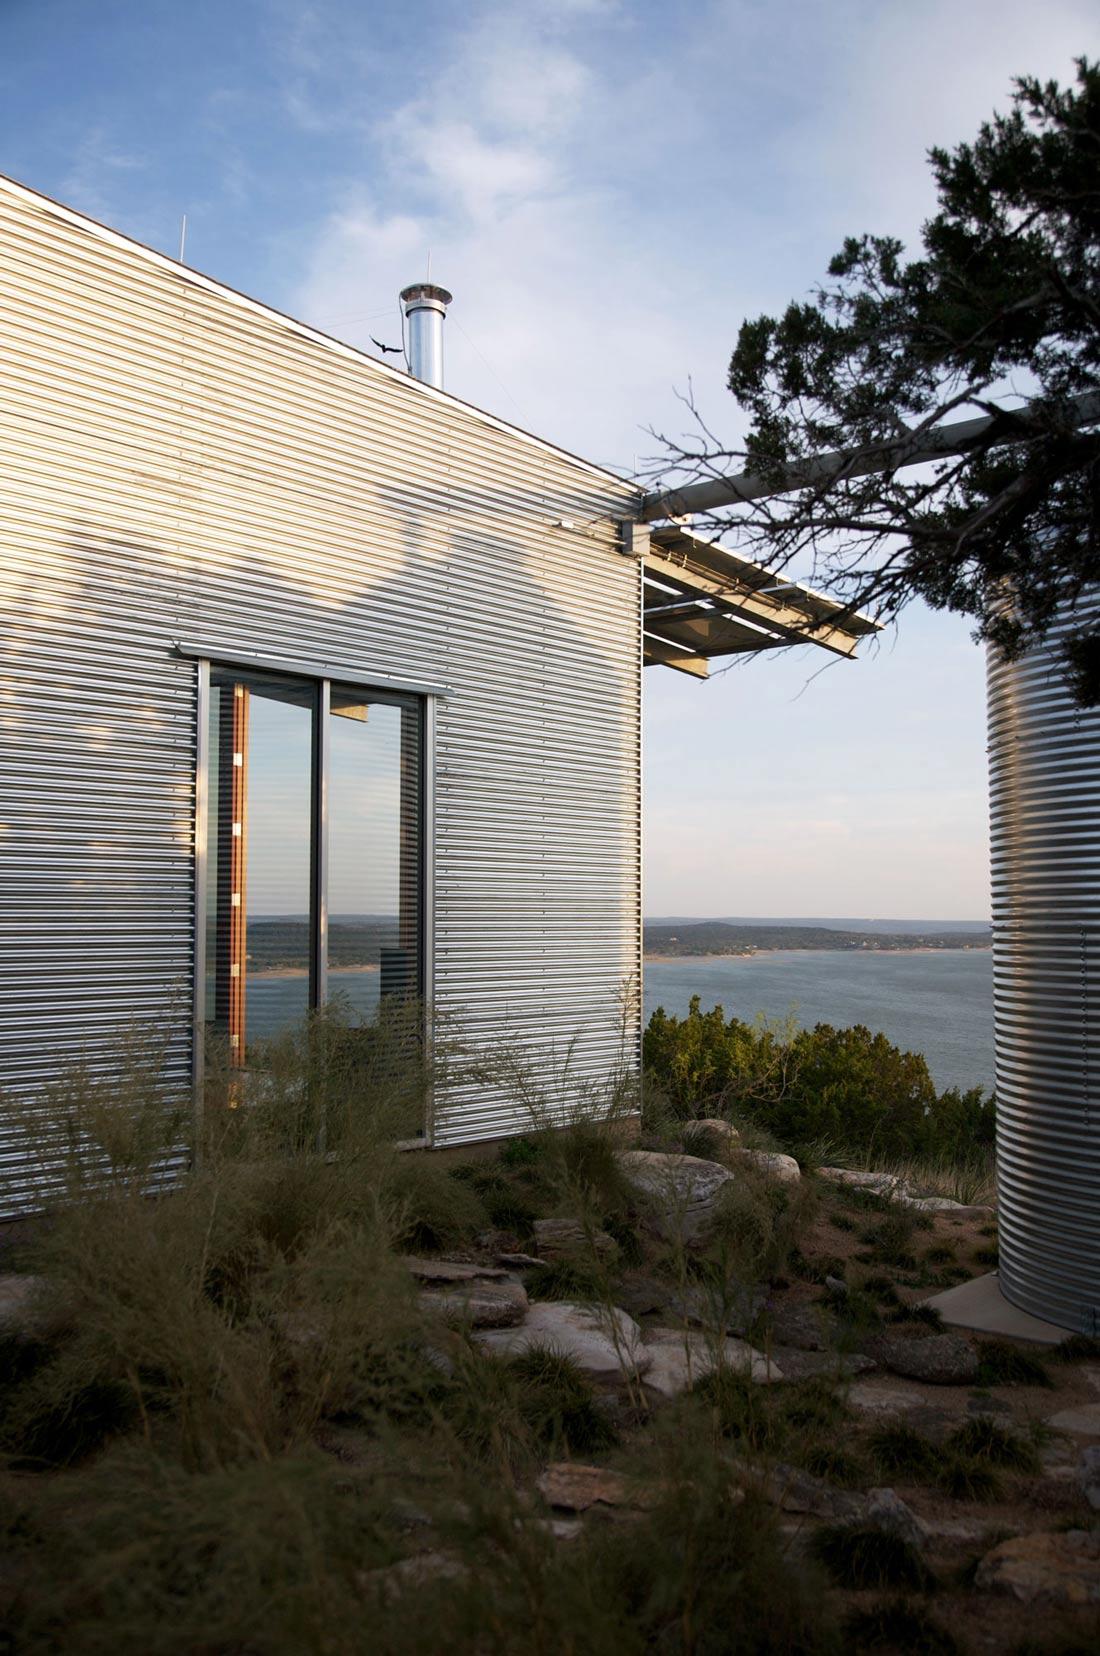 Simple Eco Friendly Home Perched Above Lake Buchanan Texas